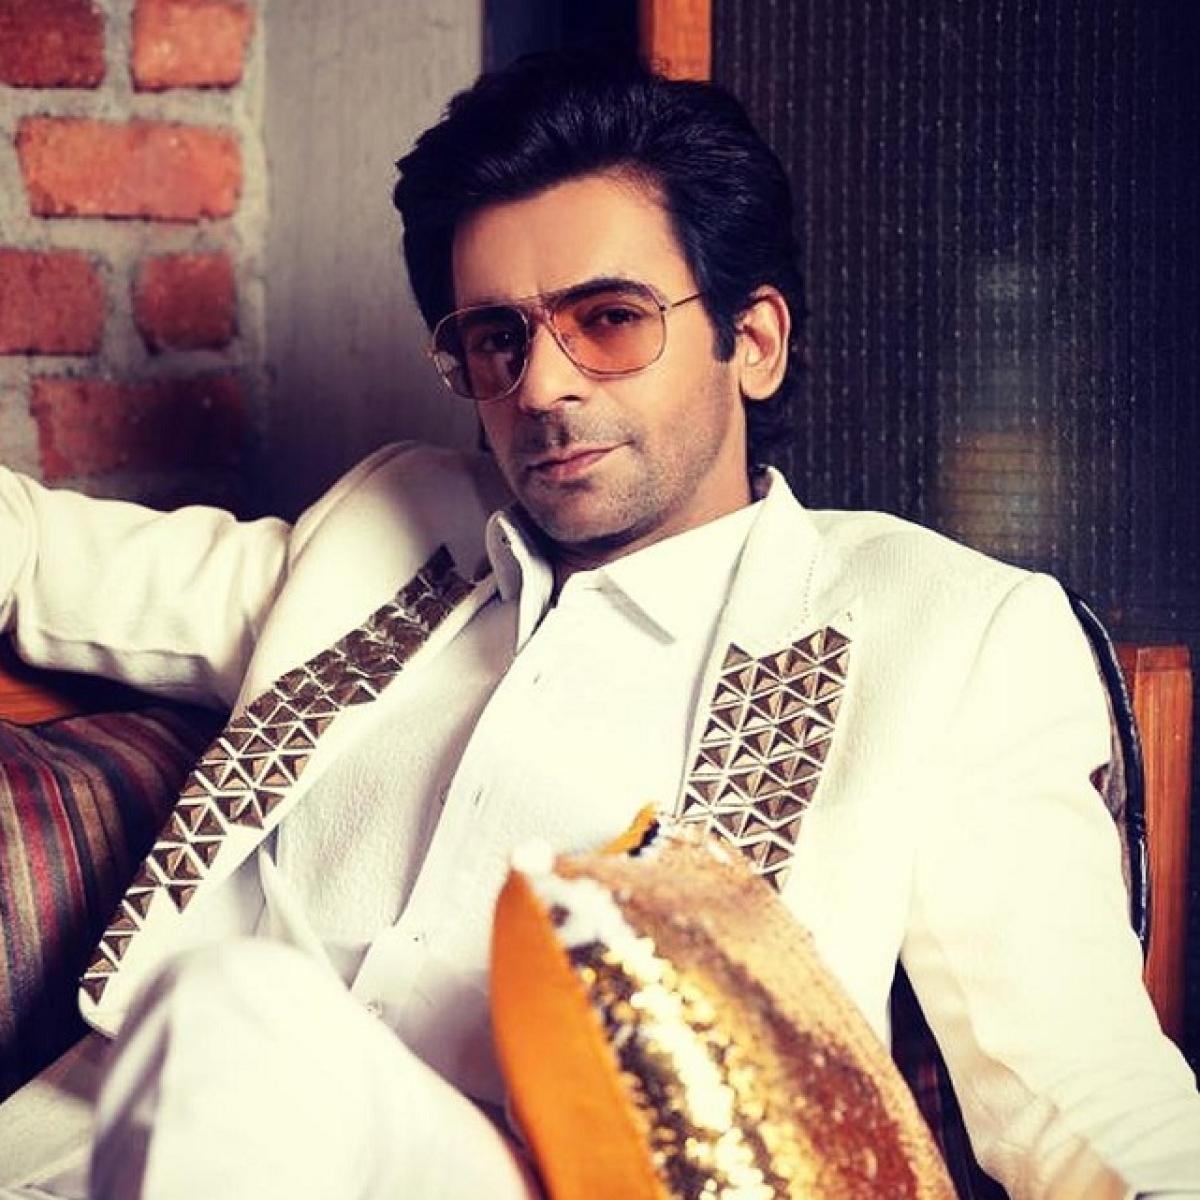 'I love mimicking actors,' says Sunil Grover